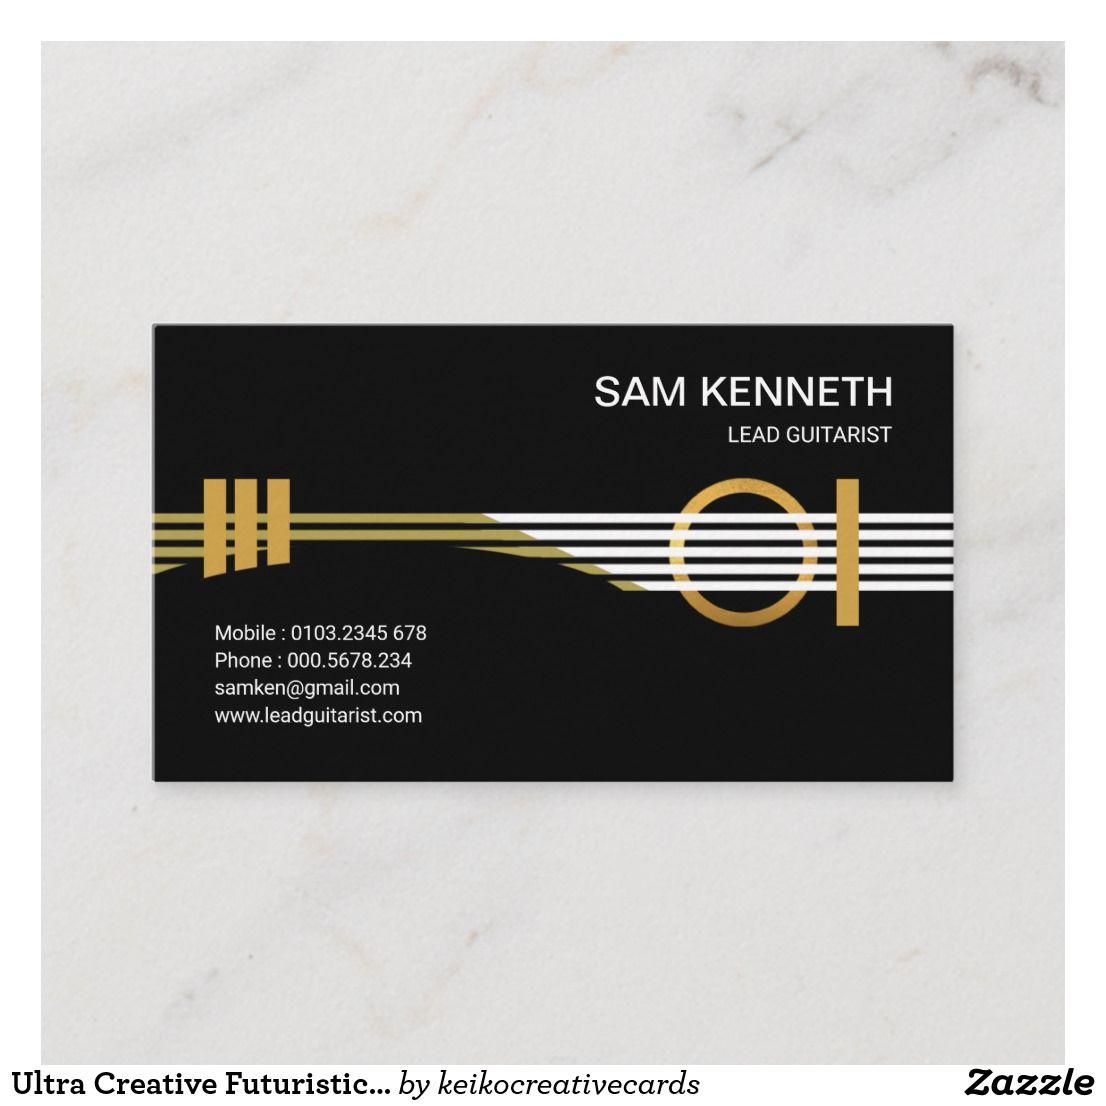 Ultra Creative Futuristic Guitarist Musician Business Card Zazzle Com In 2021 Musician Business Card Music Business Cards Social Media Design Graphics